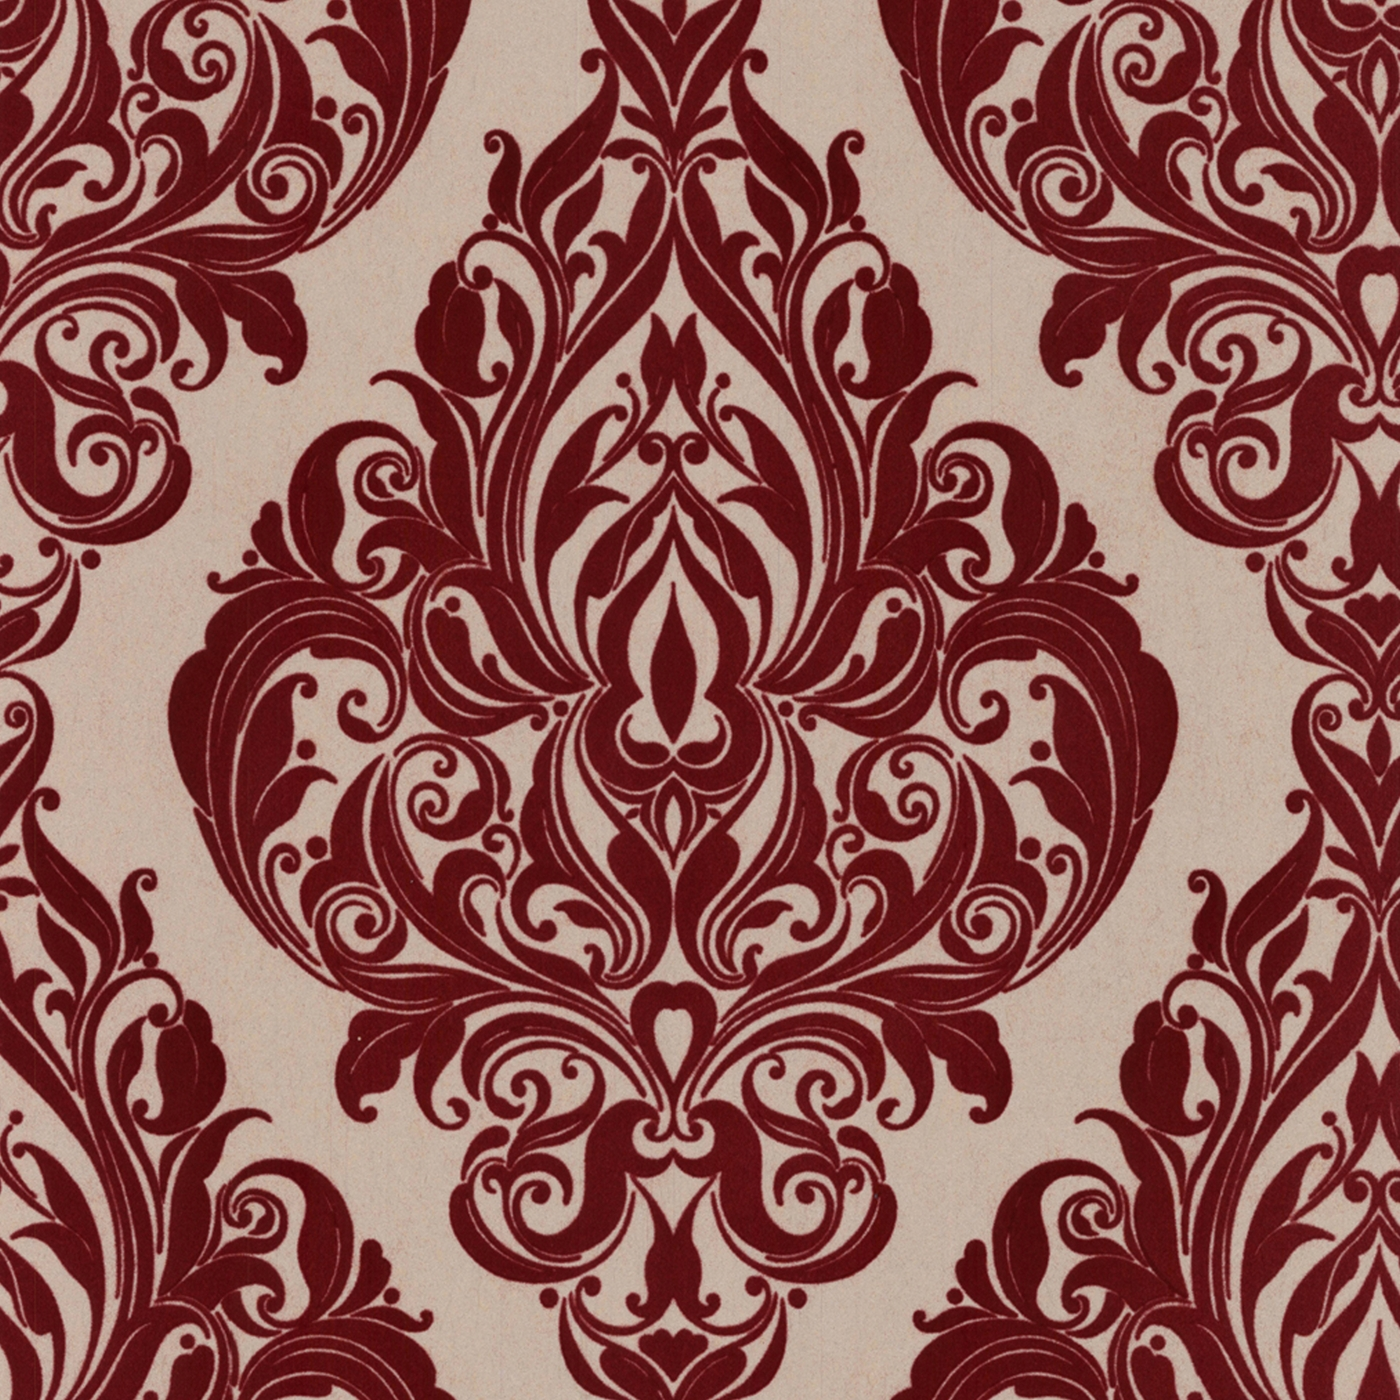 Laurence Llewelyn Bowen Bordeaux bordello Kinky Vintage flock wallpaper